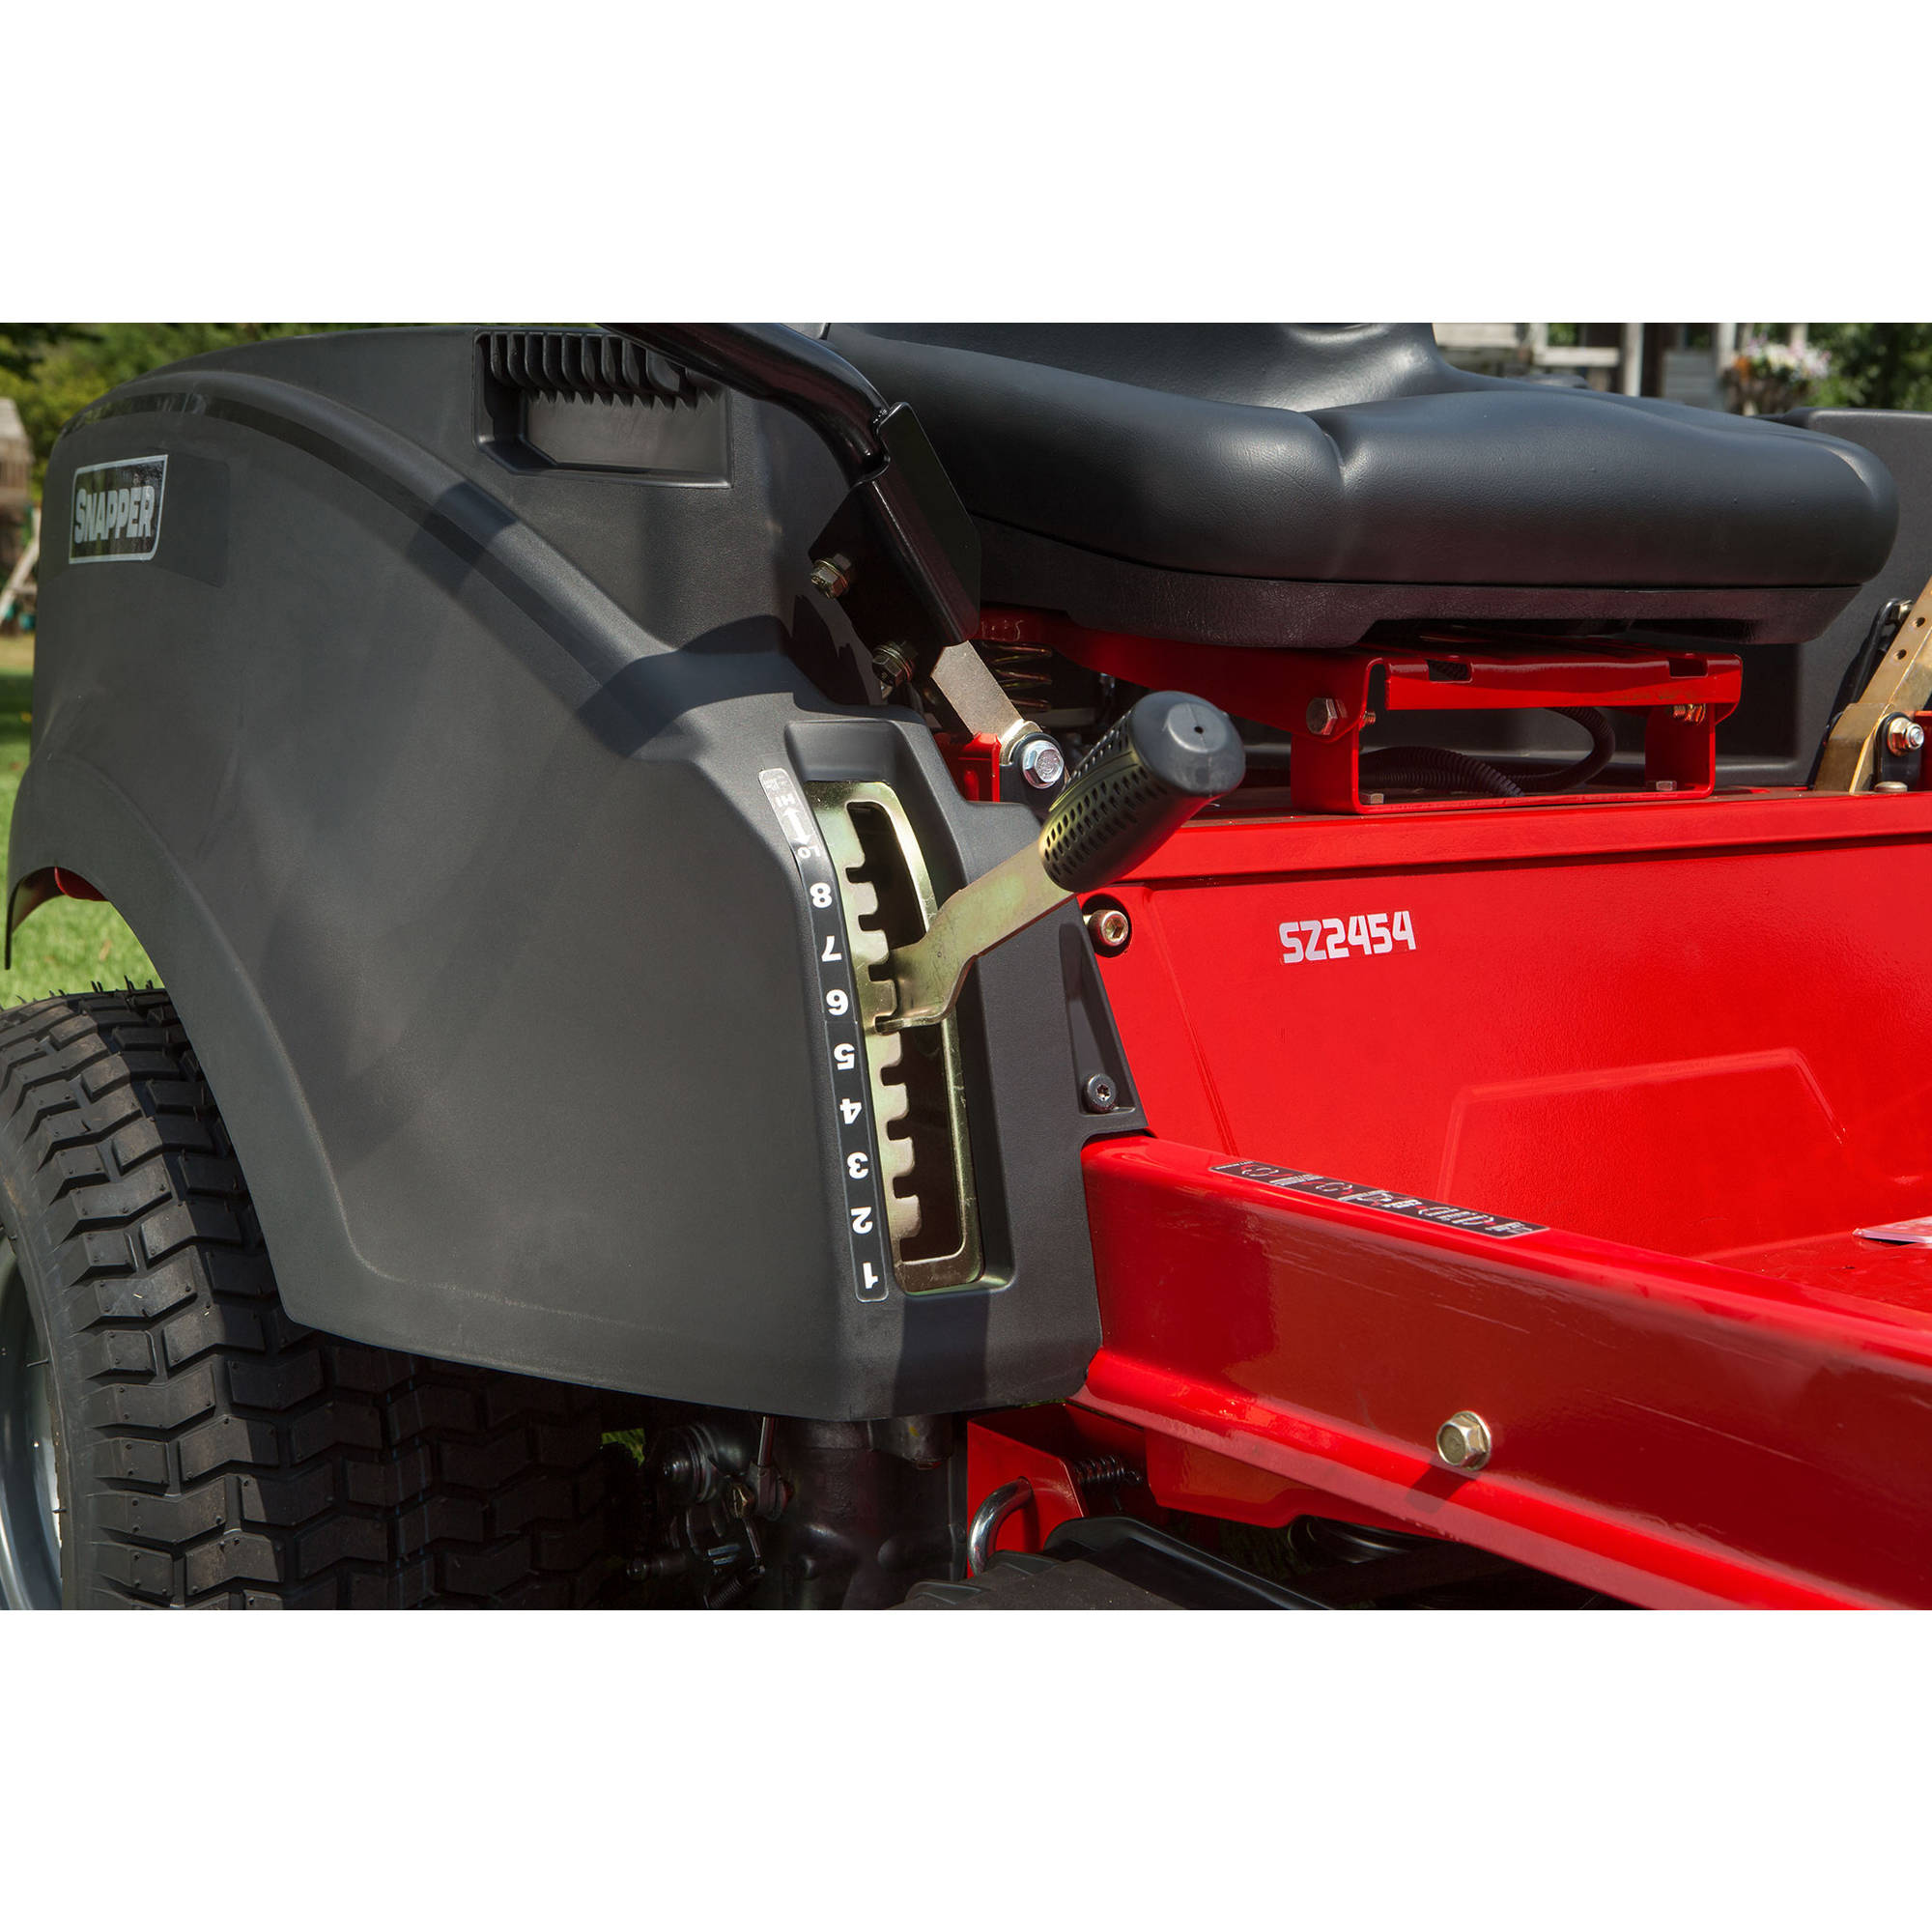 Snapper 54 24 Hp Zero Turn Riding Mower Toro Wheel Horse 312 Wiring Diagram